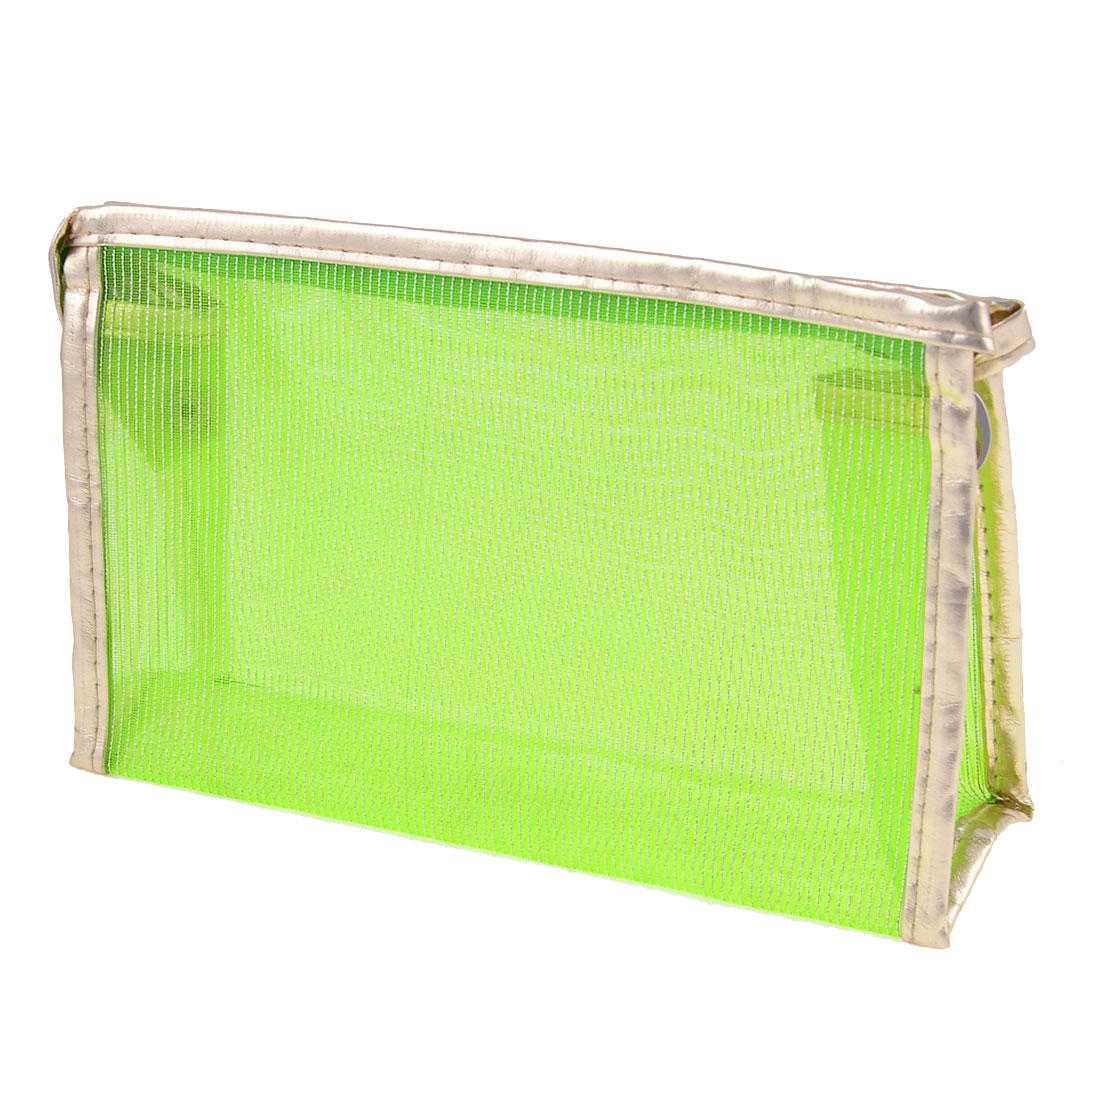 Silver Tone Green Mesh Clear Plastic Lining Zip Lock Makeup Bag